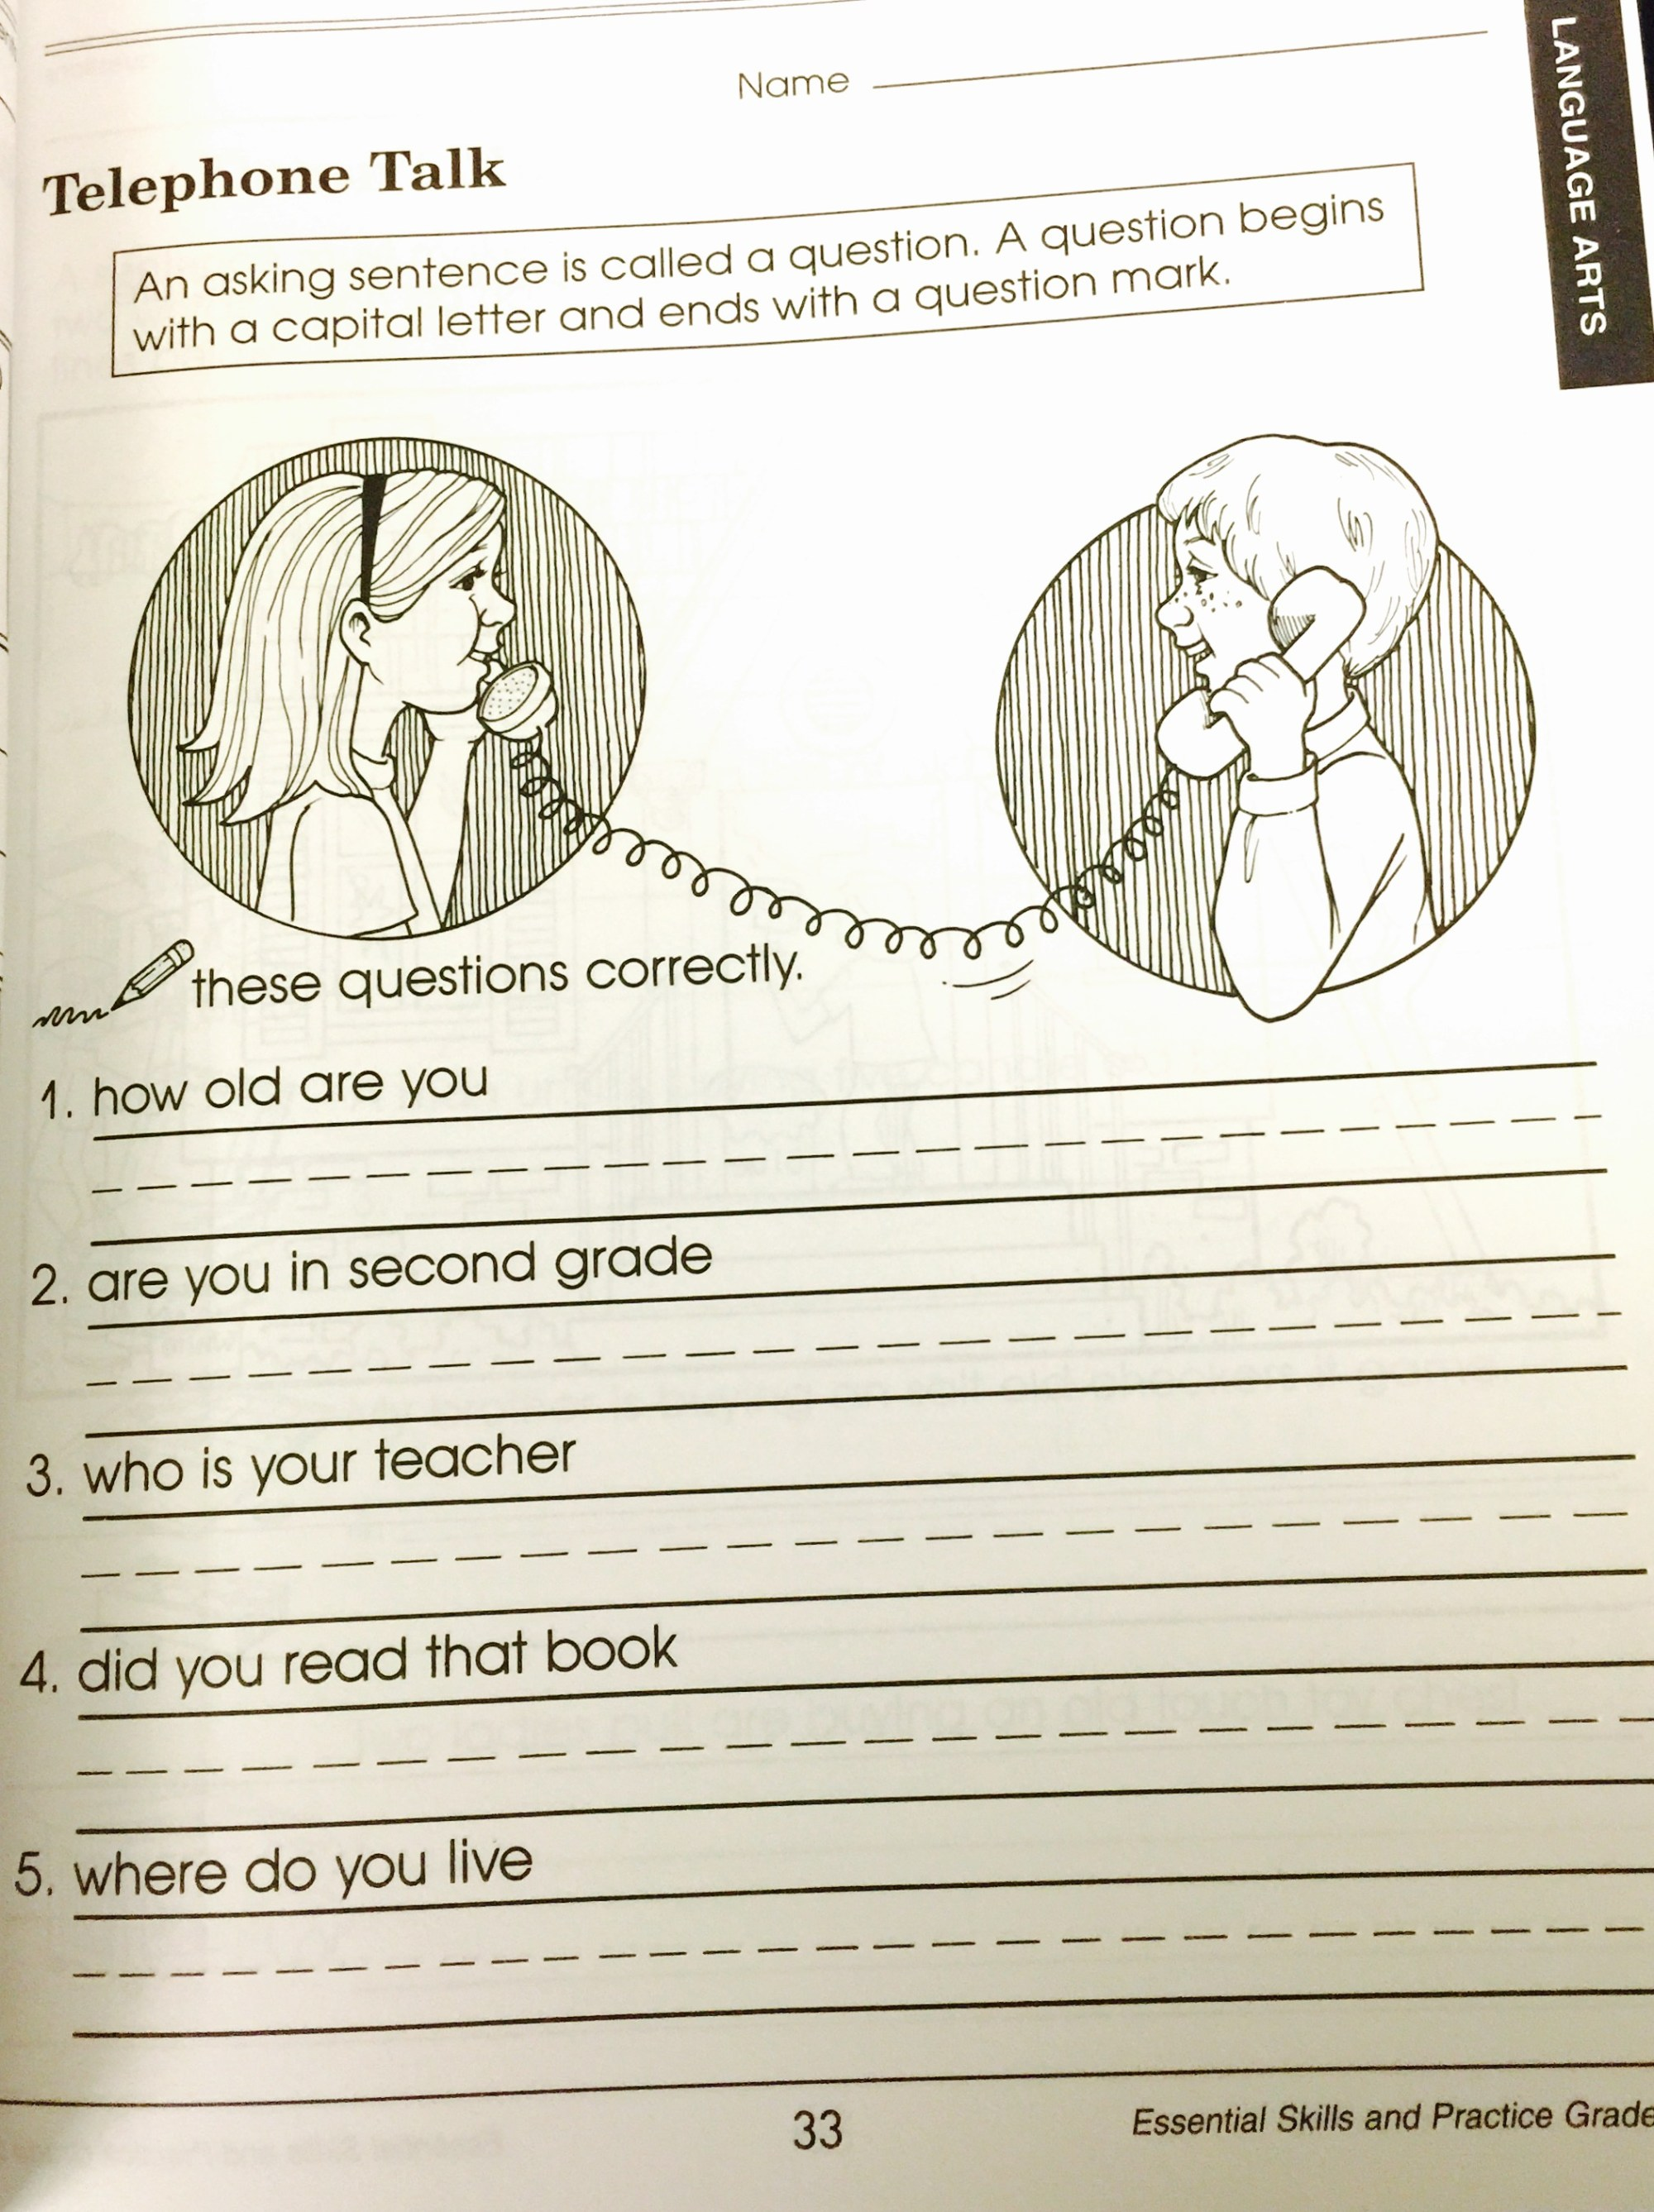 hight resolution of Go math grade 3 homework help - Go Math 5th Grade 3.8 homework help